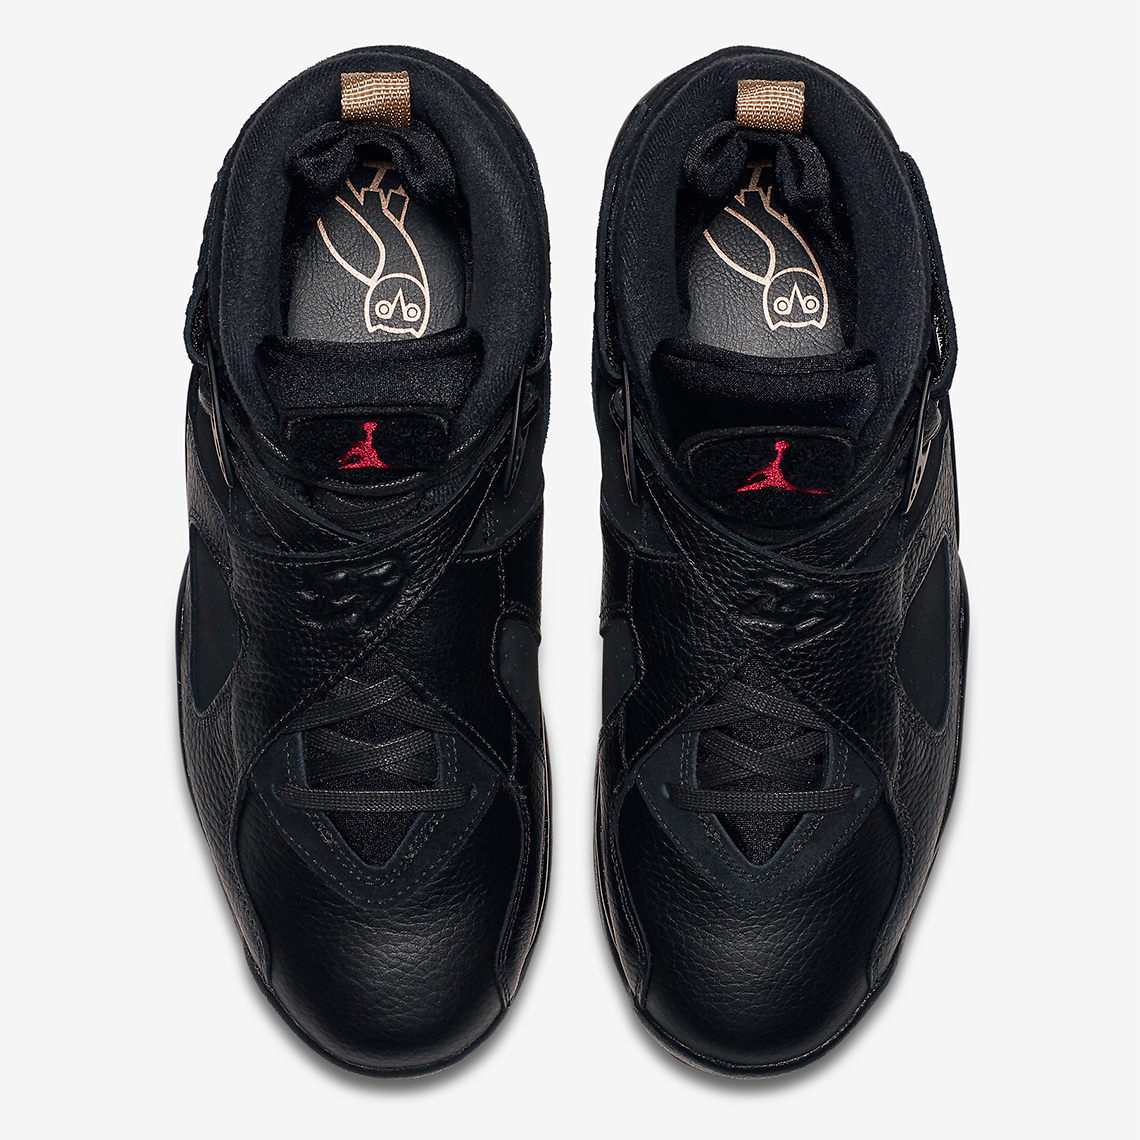 OVO x Air Jordan 8 Black Nike SNKRS Draw Release Info  5ff981b14